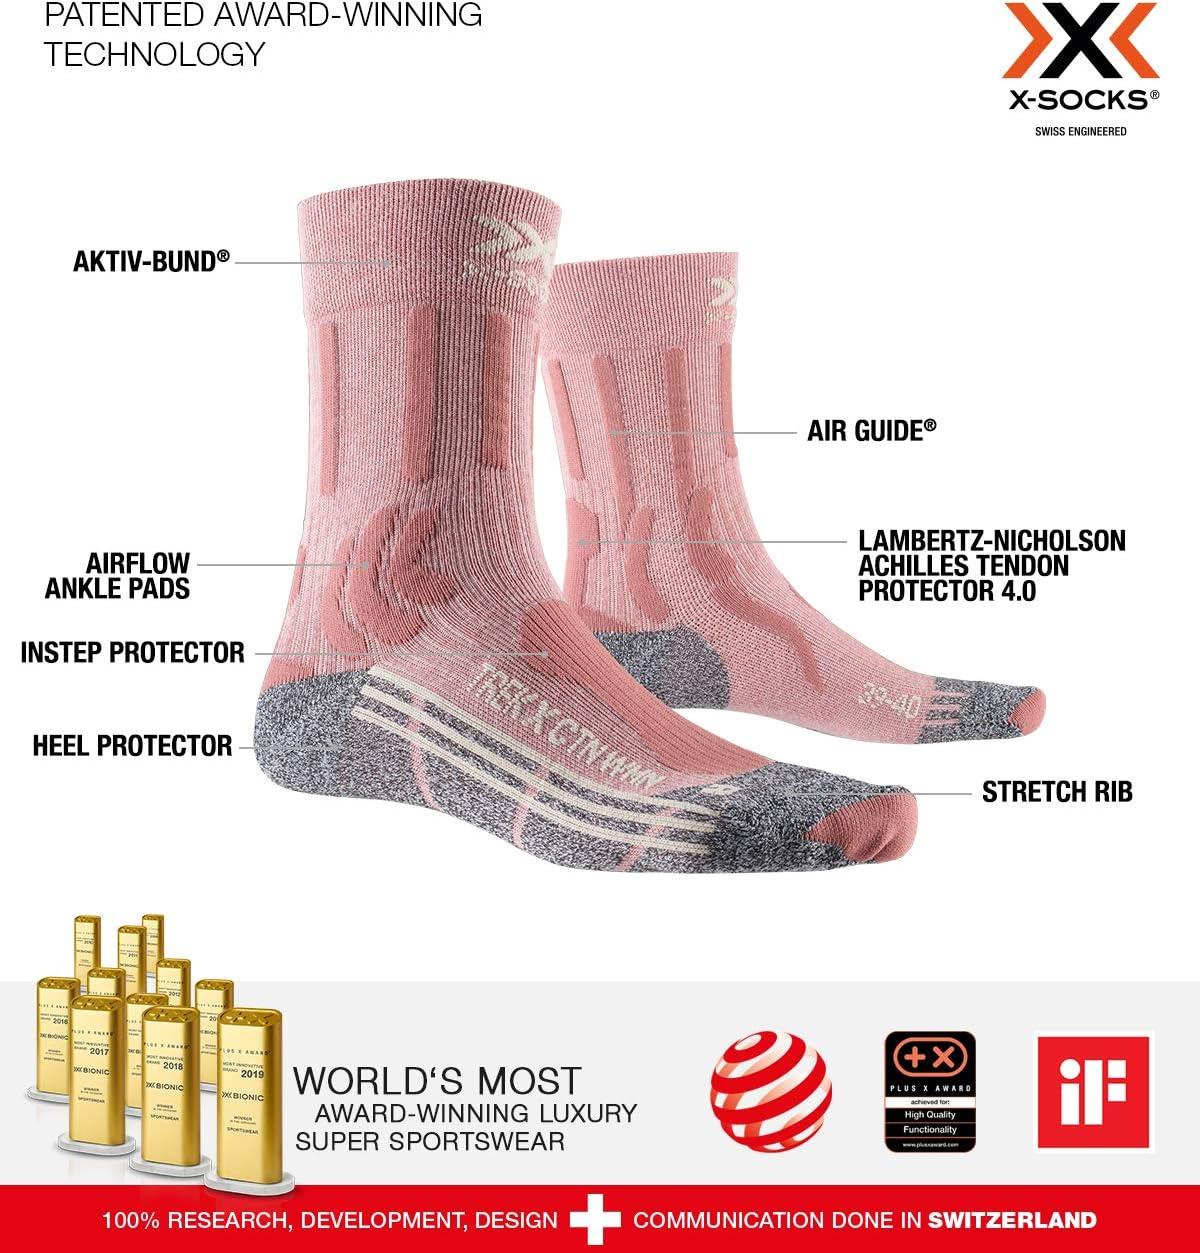 Unisex Adulto X-Socks Trek X Cotton Woman Socks Calcetines de Senderismo Trekking Mujer